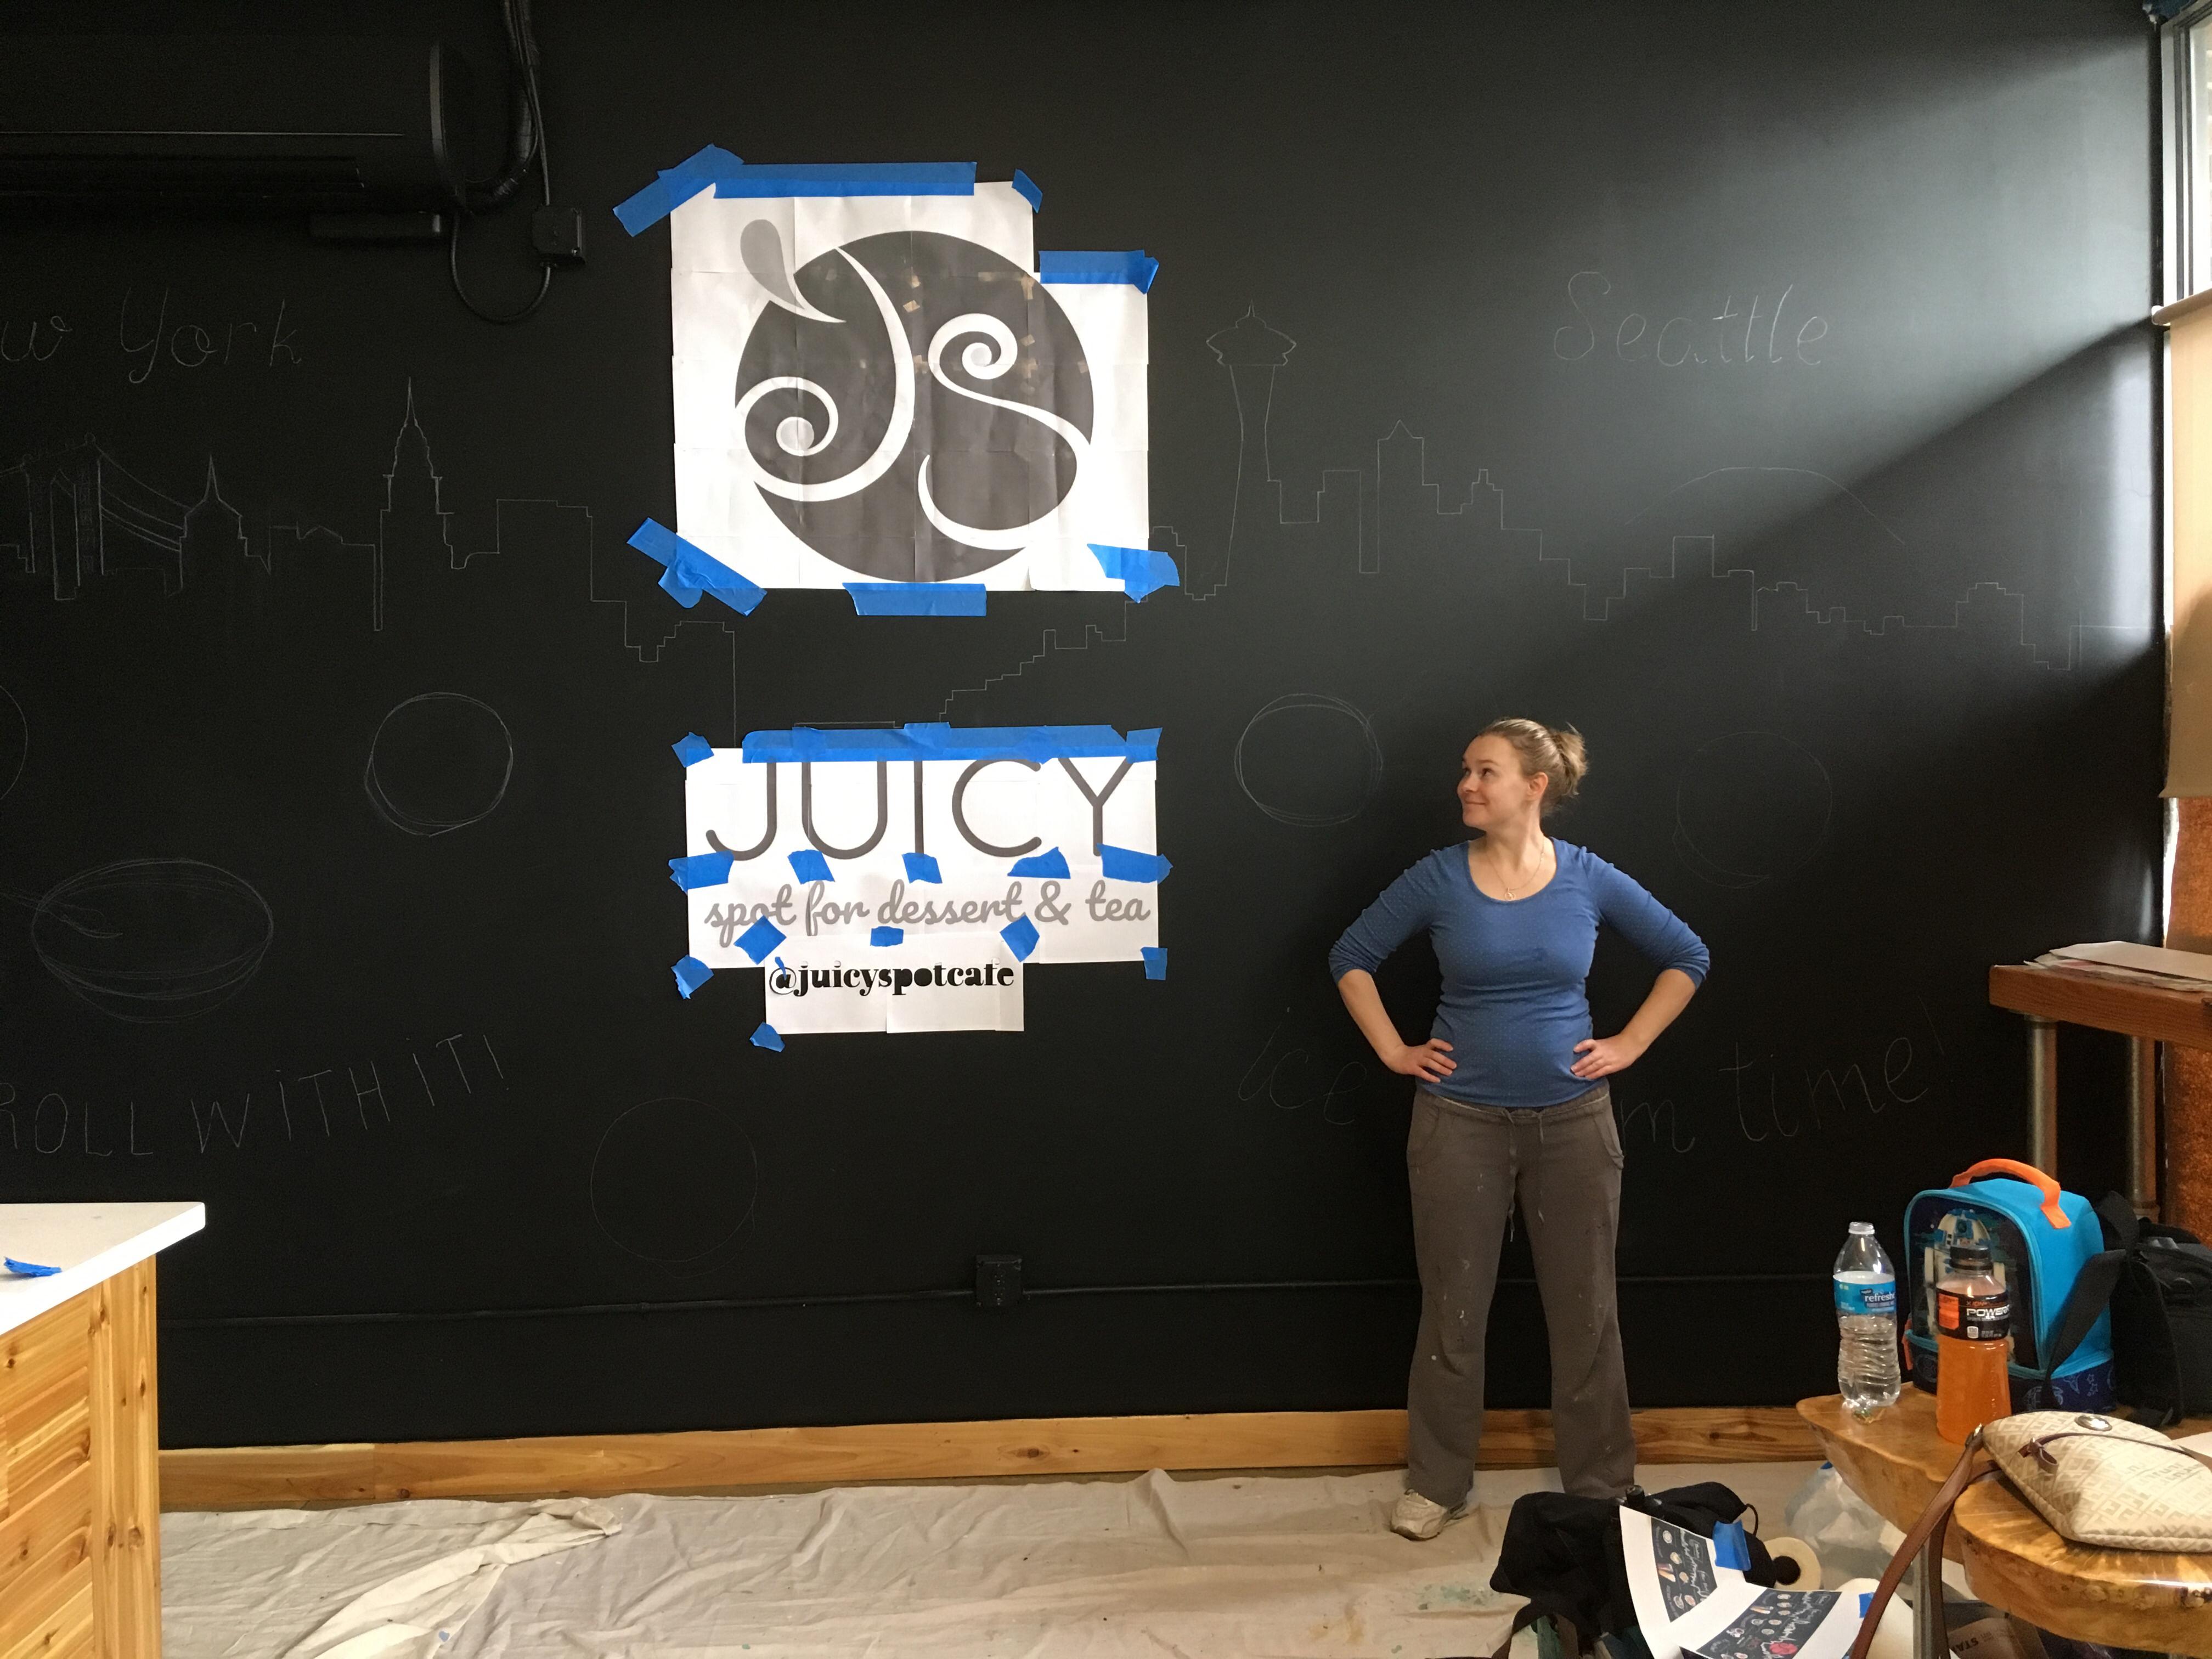 Juicy Spot Cafe mural by Tamara Hergert